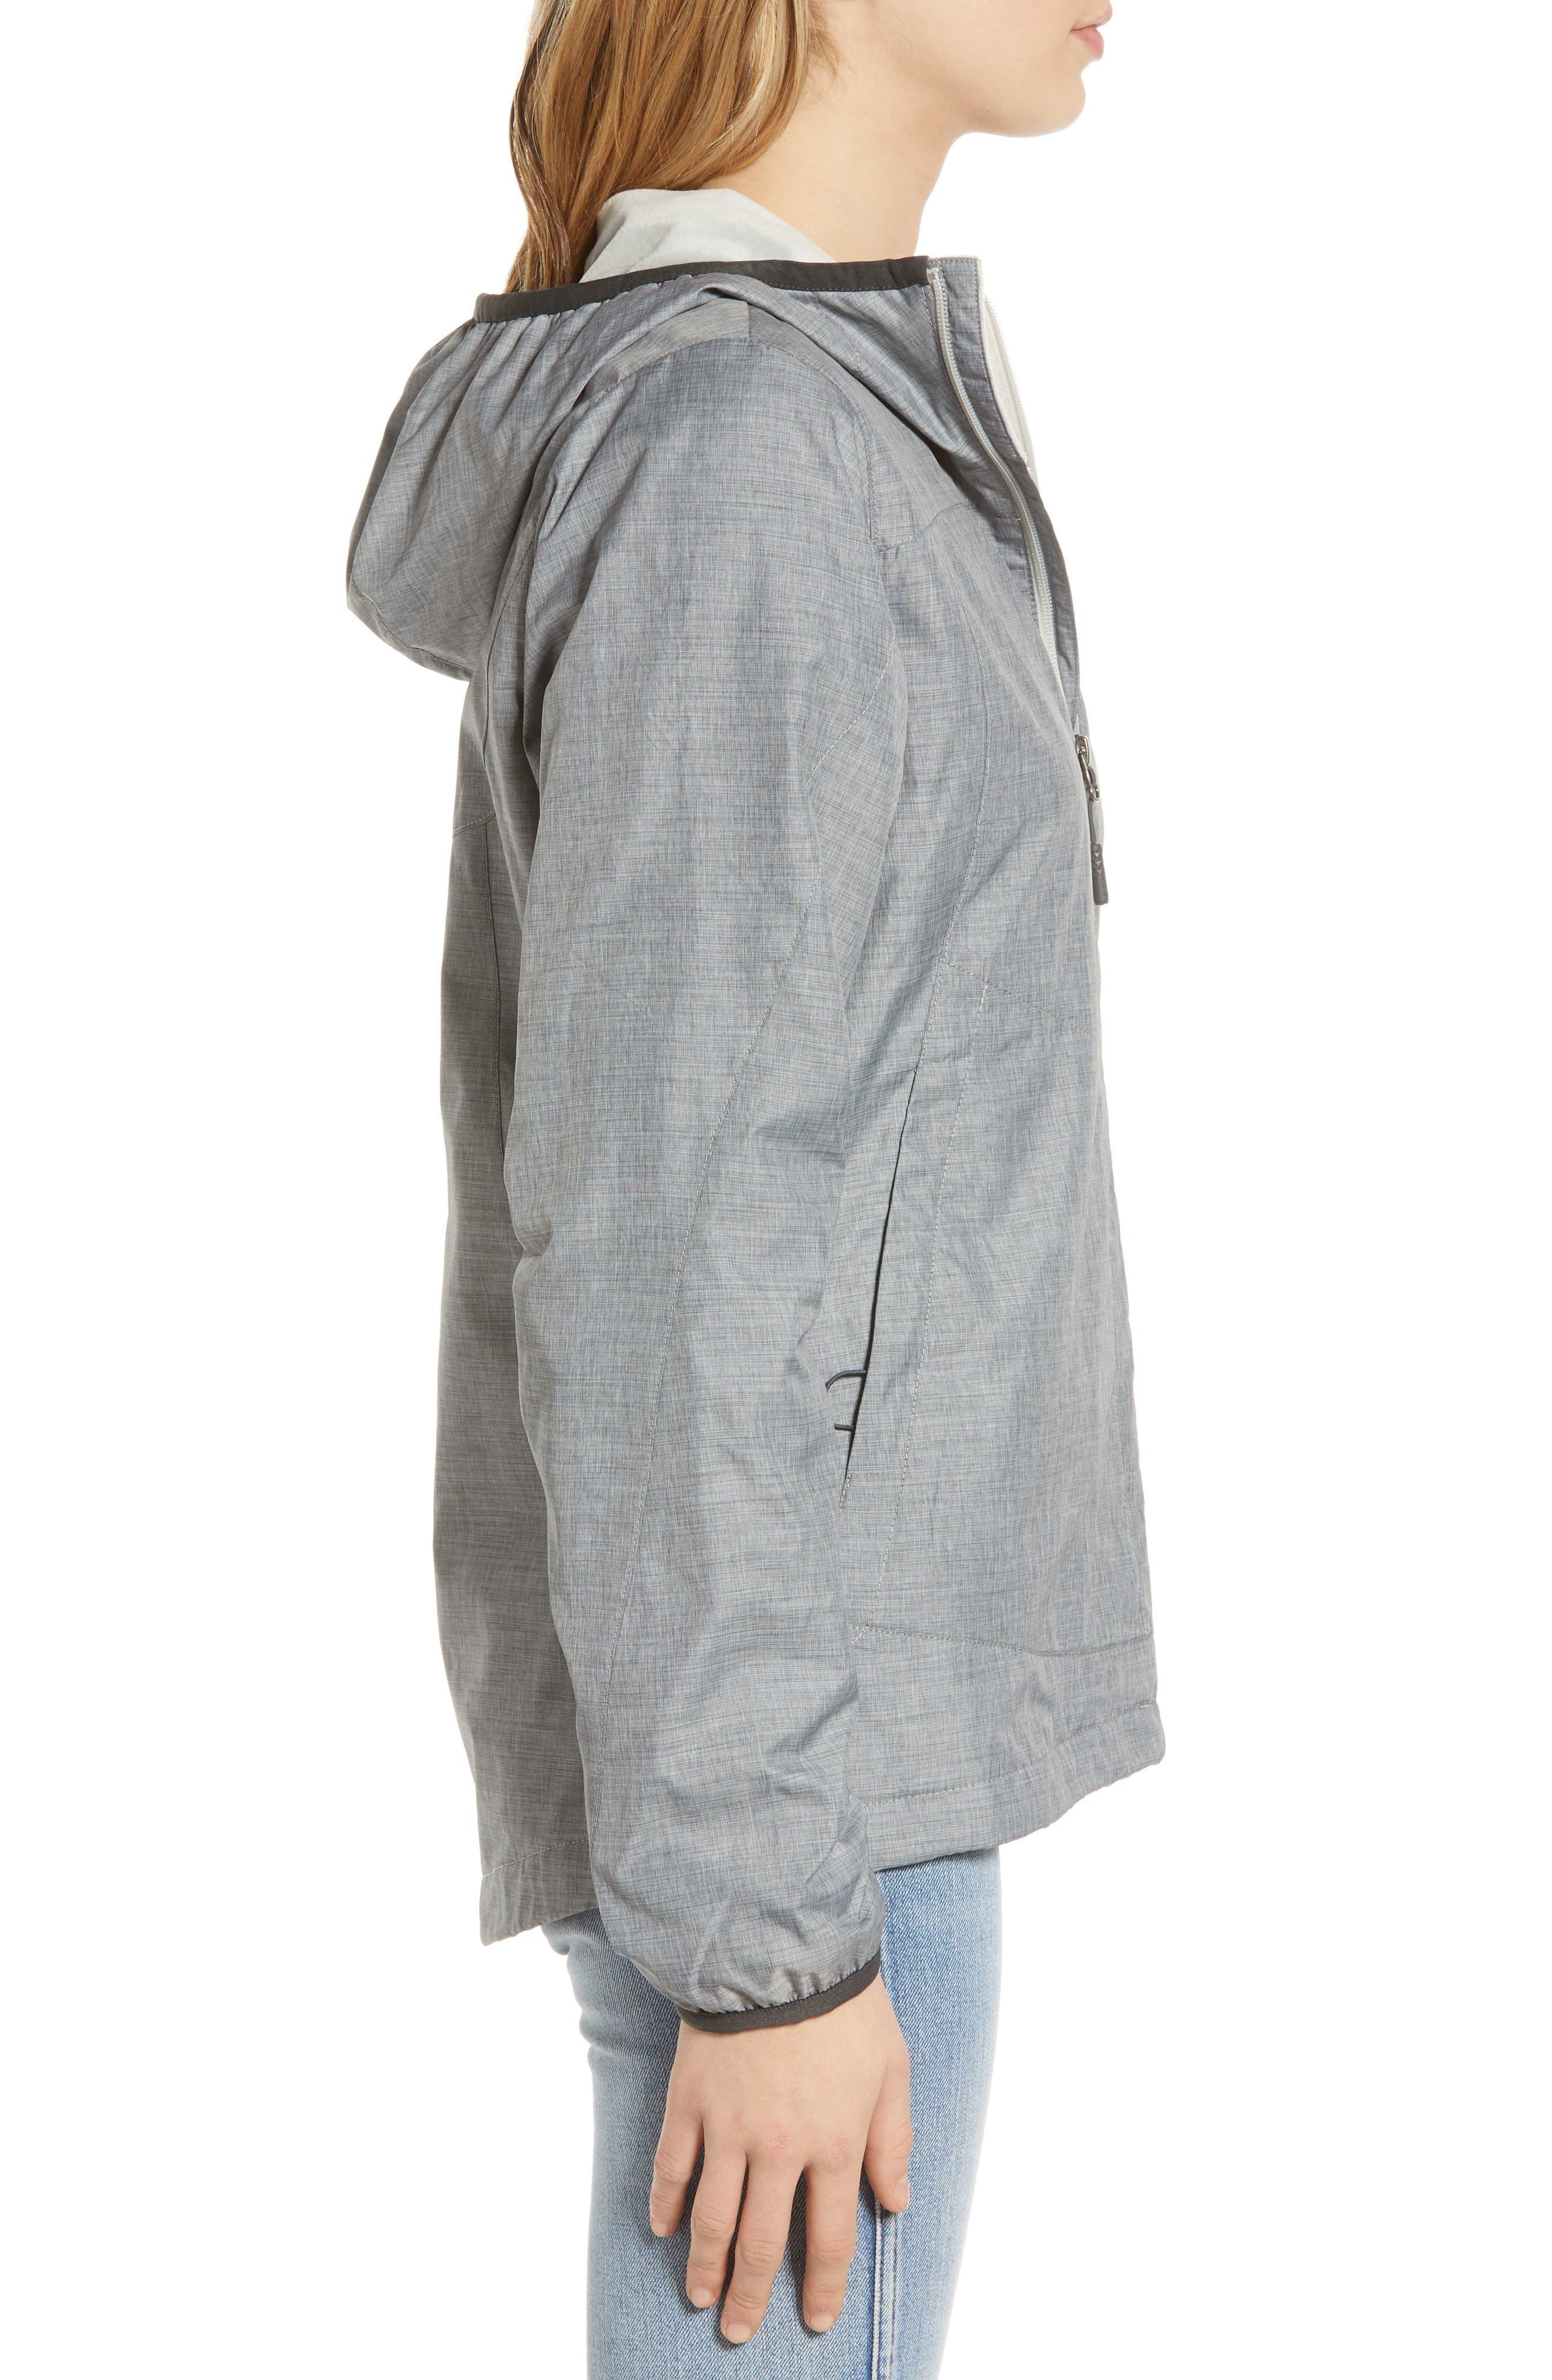 THE NORTH FACE, Pitaya 2 Hooded Jacket, Alternate thumbnail 4, color, 021